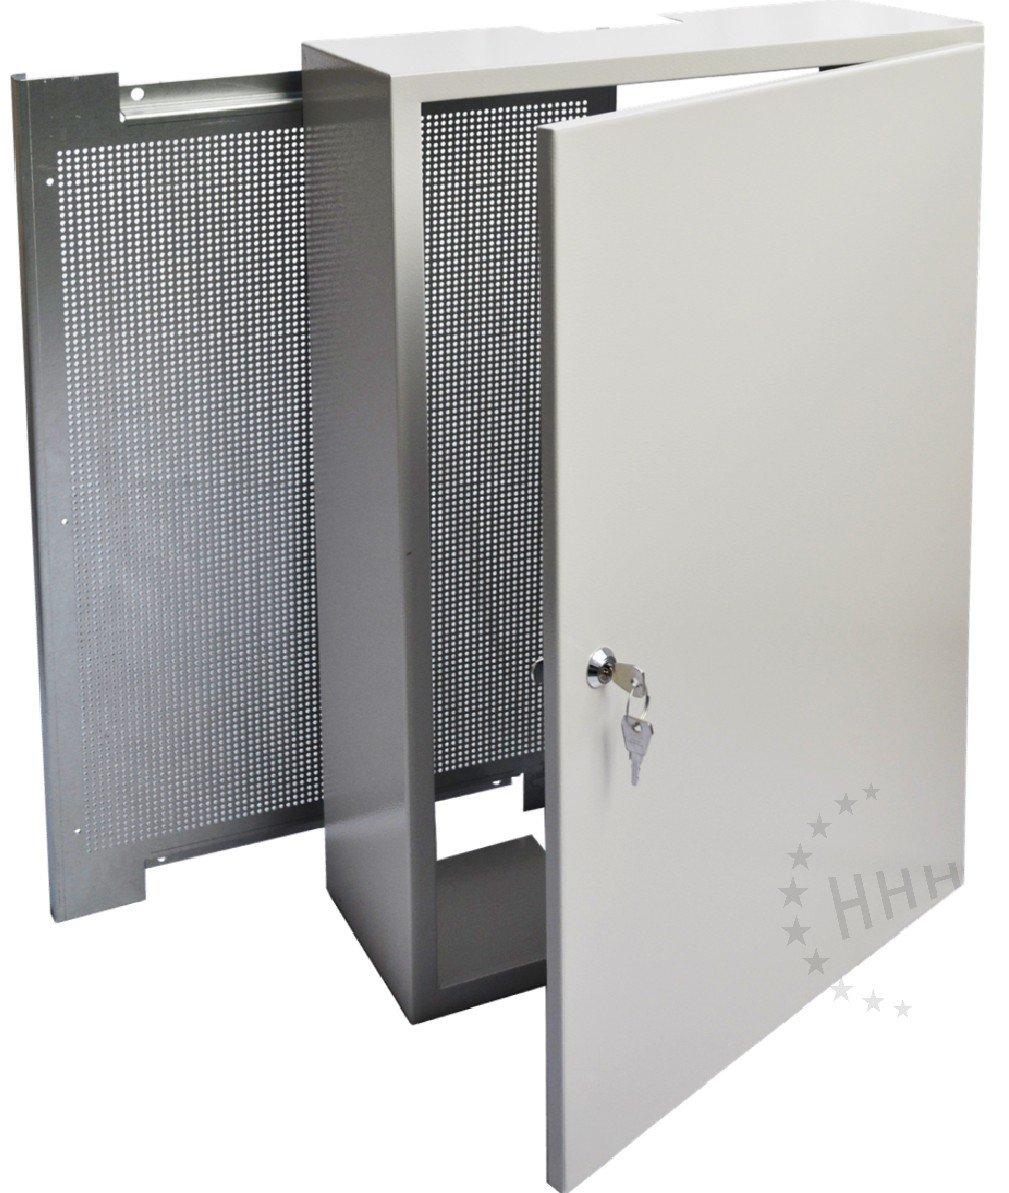 Antennenschrank Montageschrank mit feuerfester: Amazon.de: Elektronik